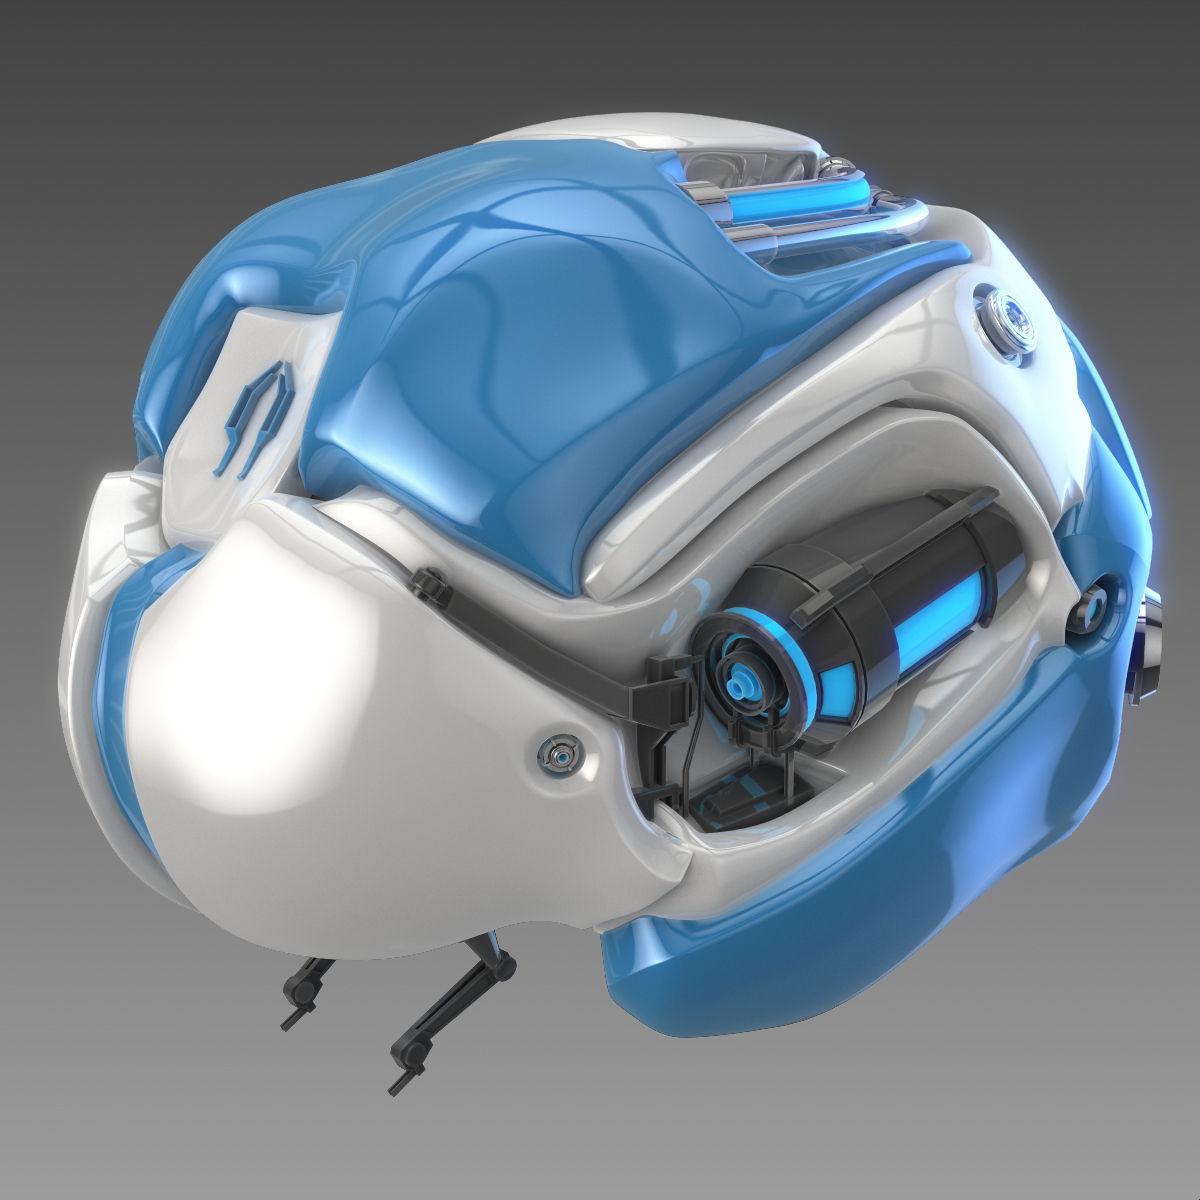 Artificial brain concept